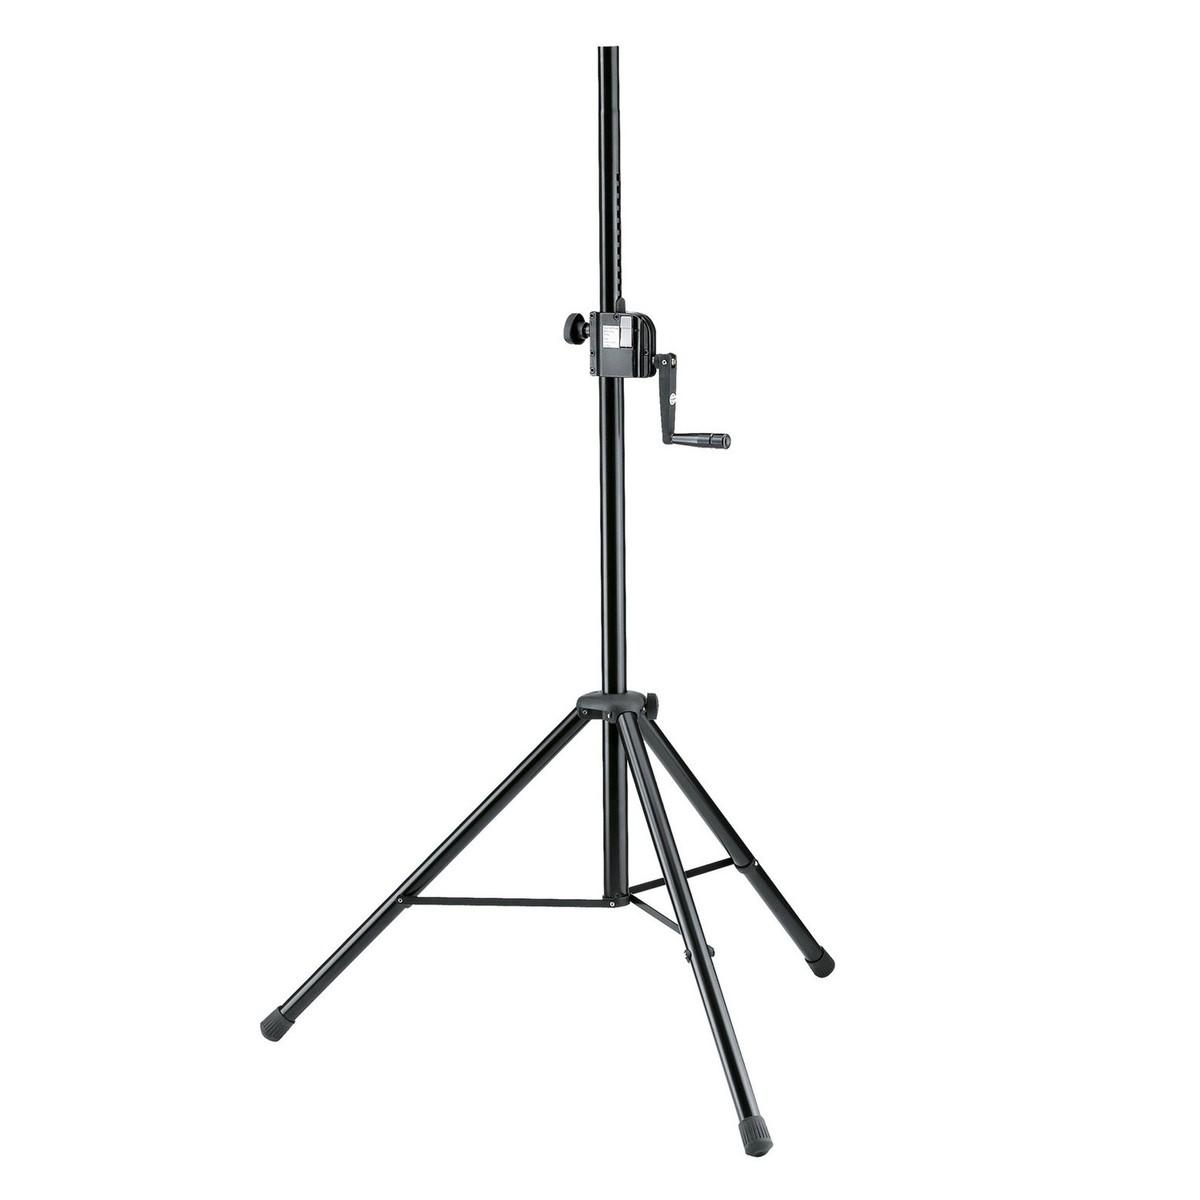 K&M 21302 Speaker Stand, Black at Gear4music